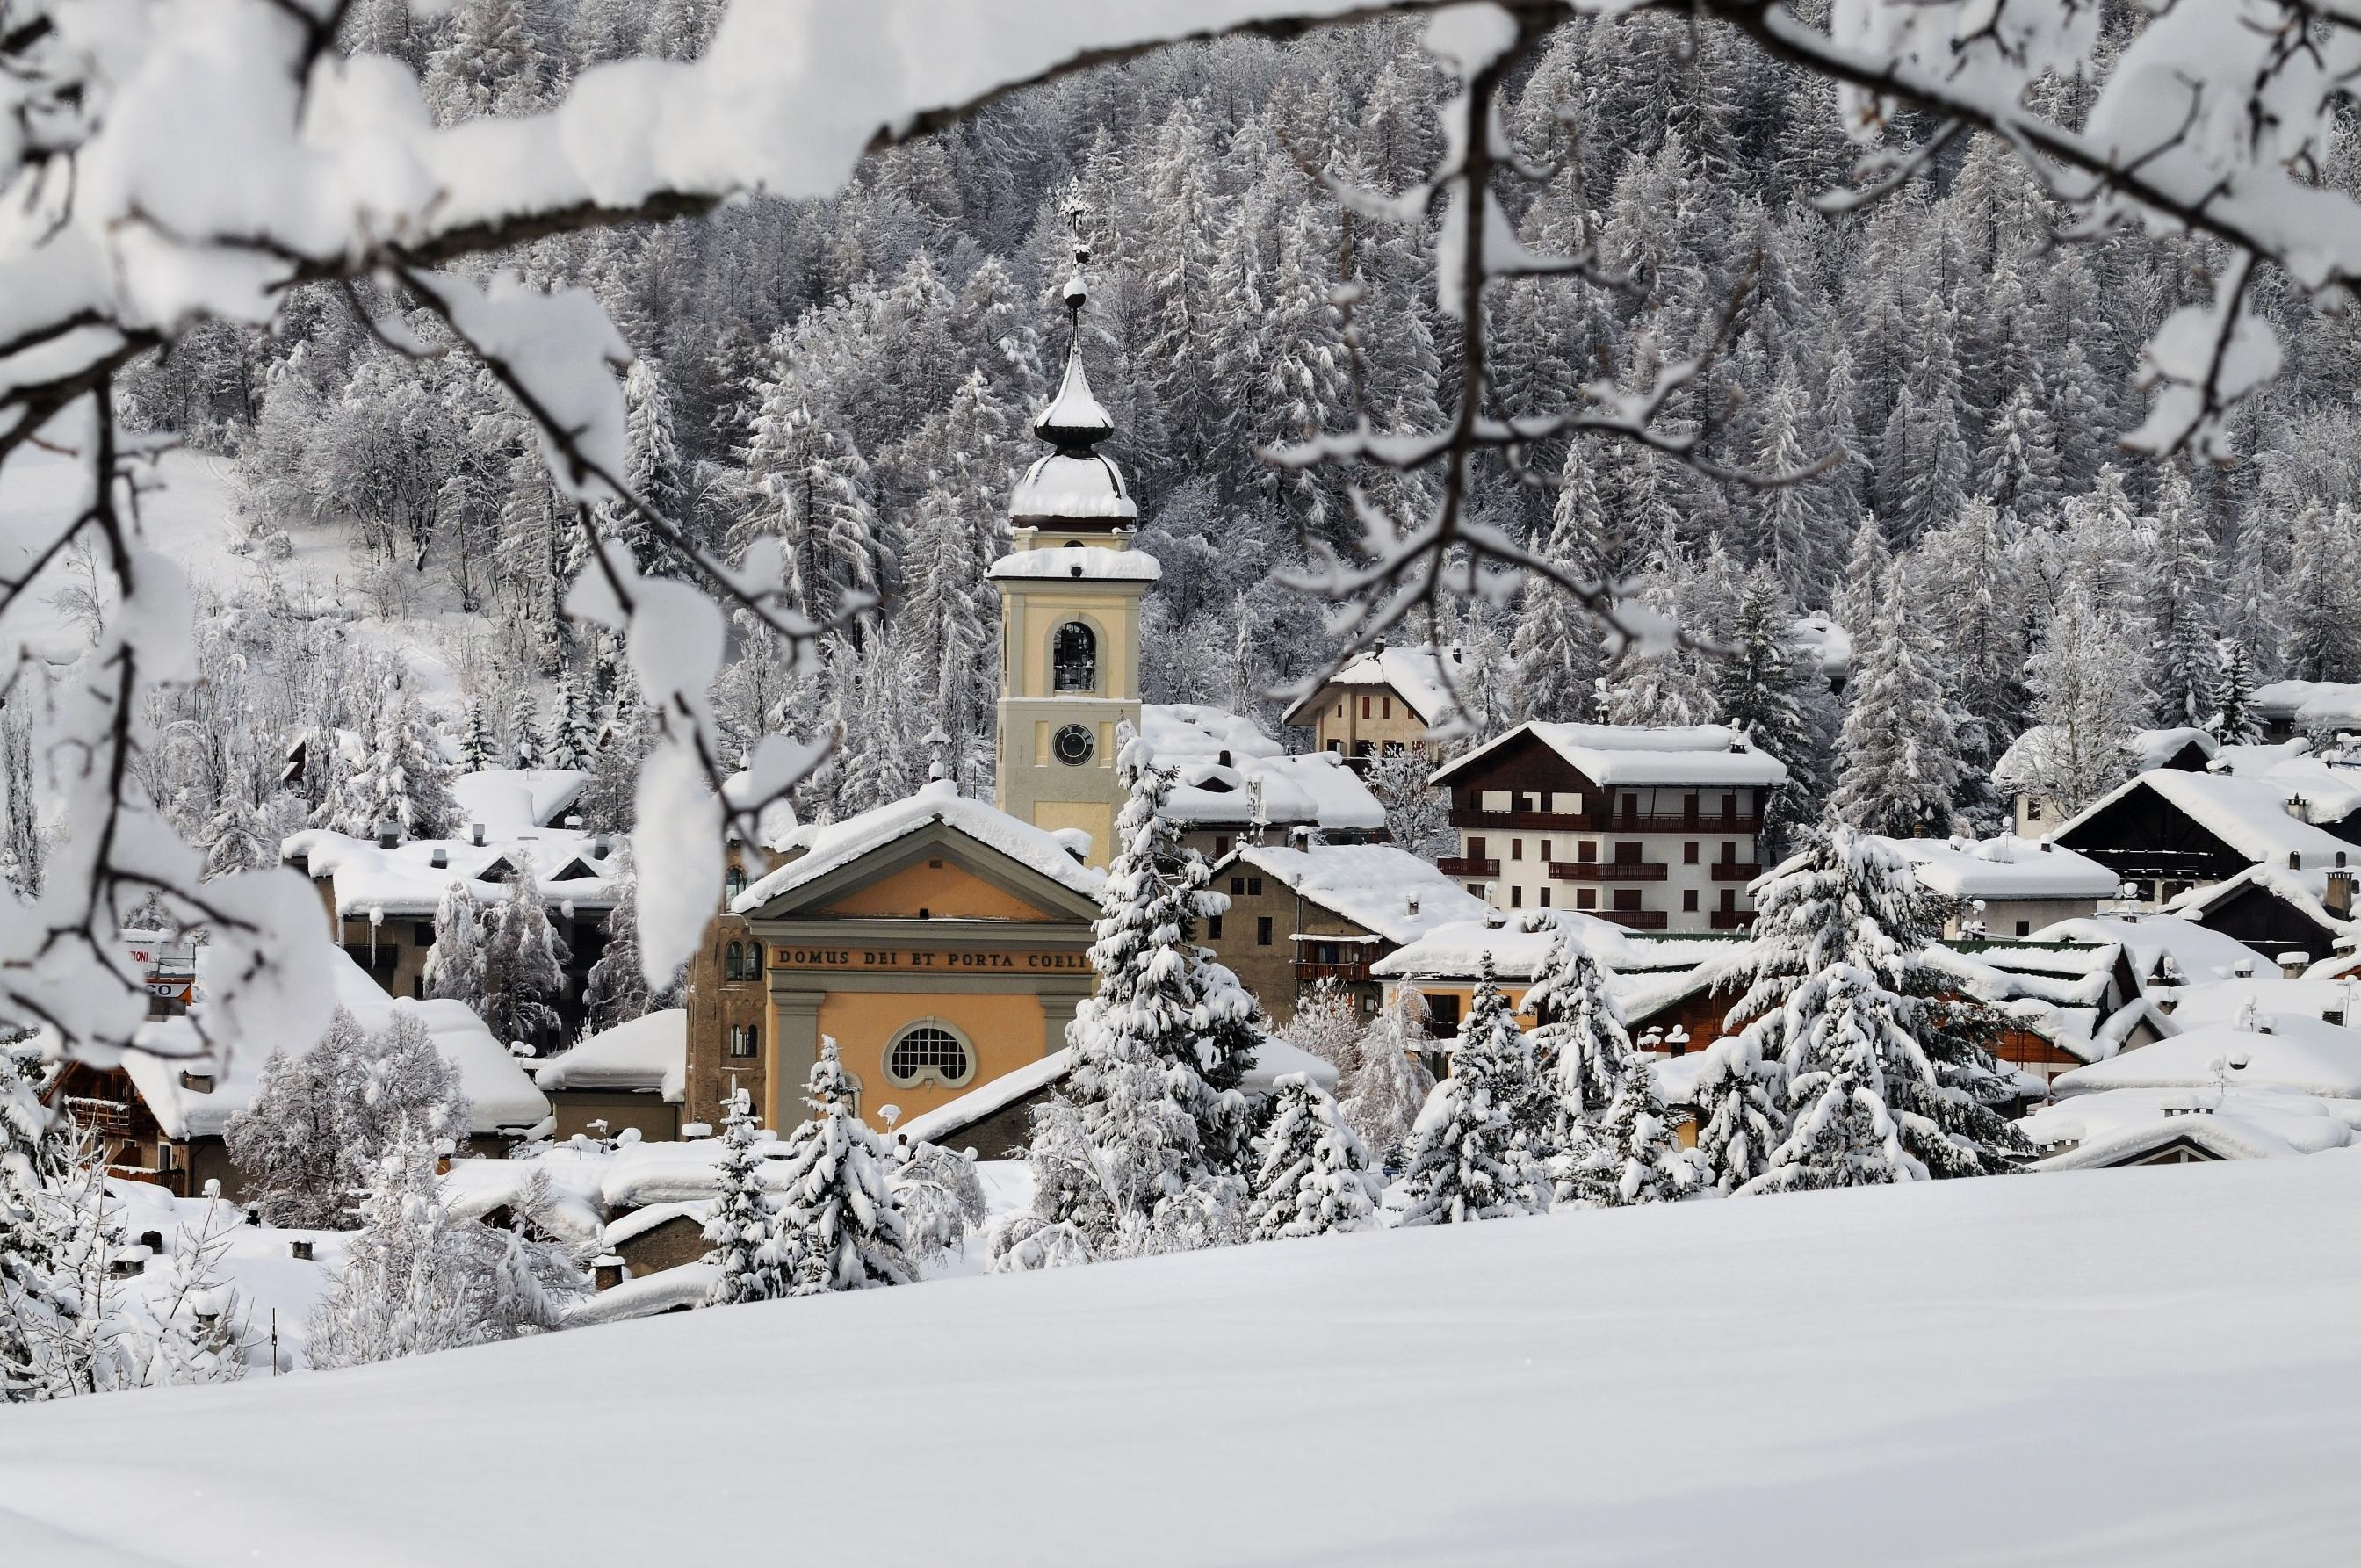 Bardonecchia Old Town ski resort Italy